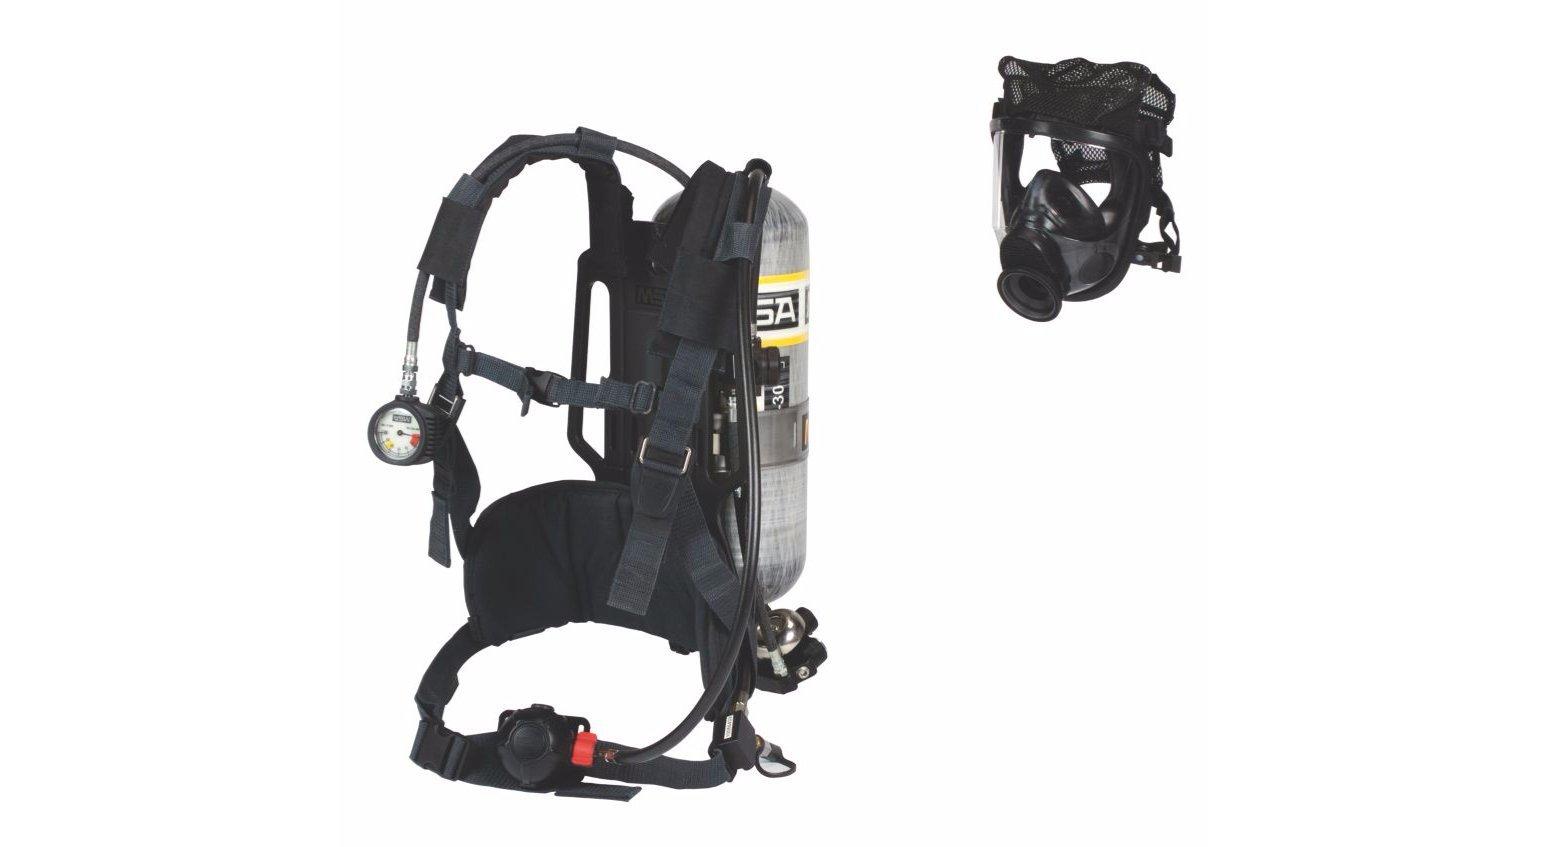 MSA 10095804 AirHawk II Industrial Air Mask - Adv 4000, Medium Hycar, Polyester Net Head Harness, Aluminum - 30 minutes, Hard Case, Black